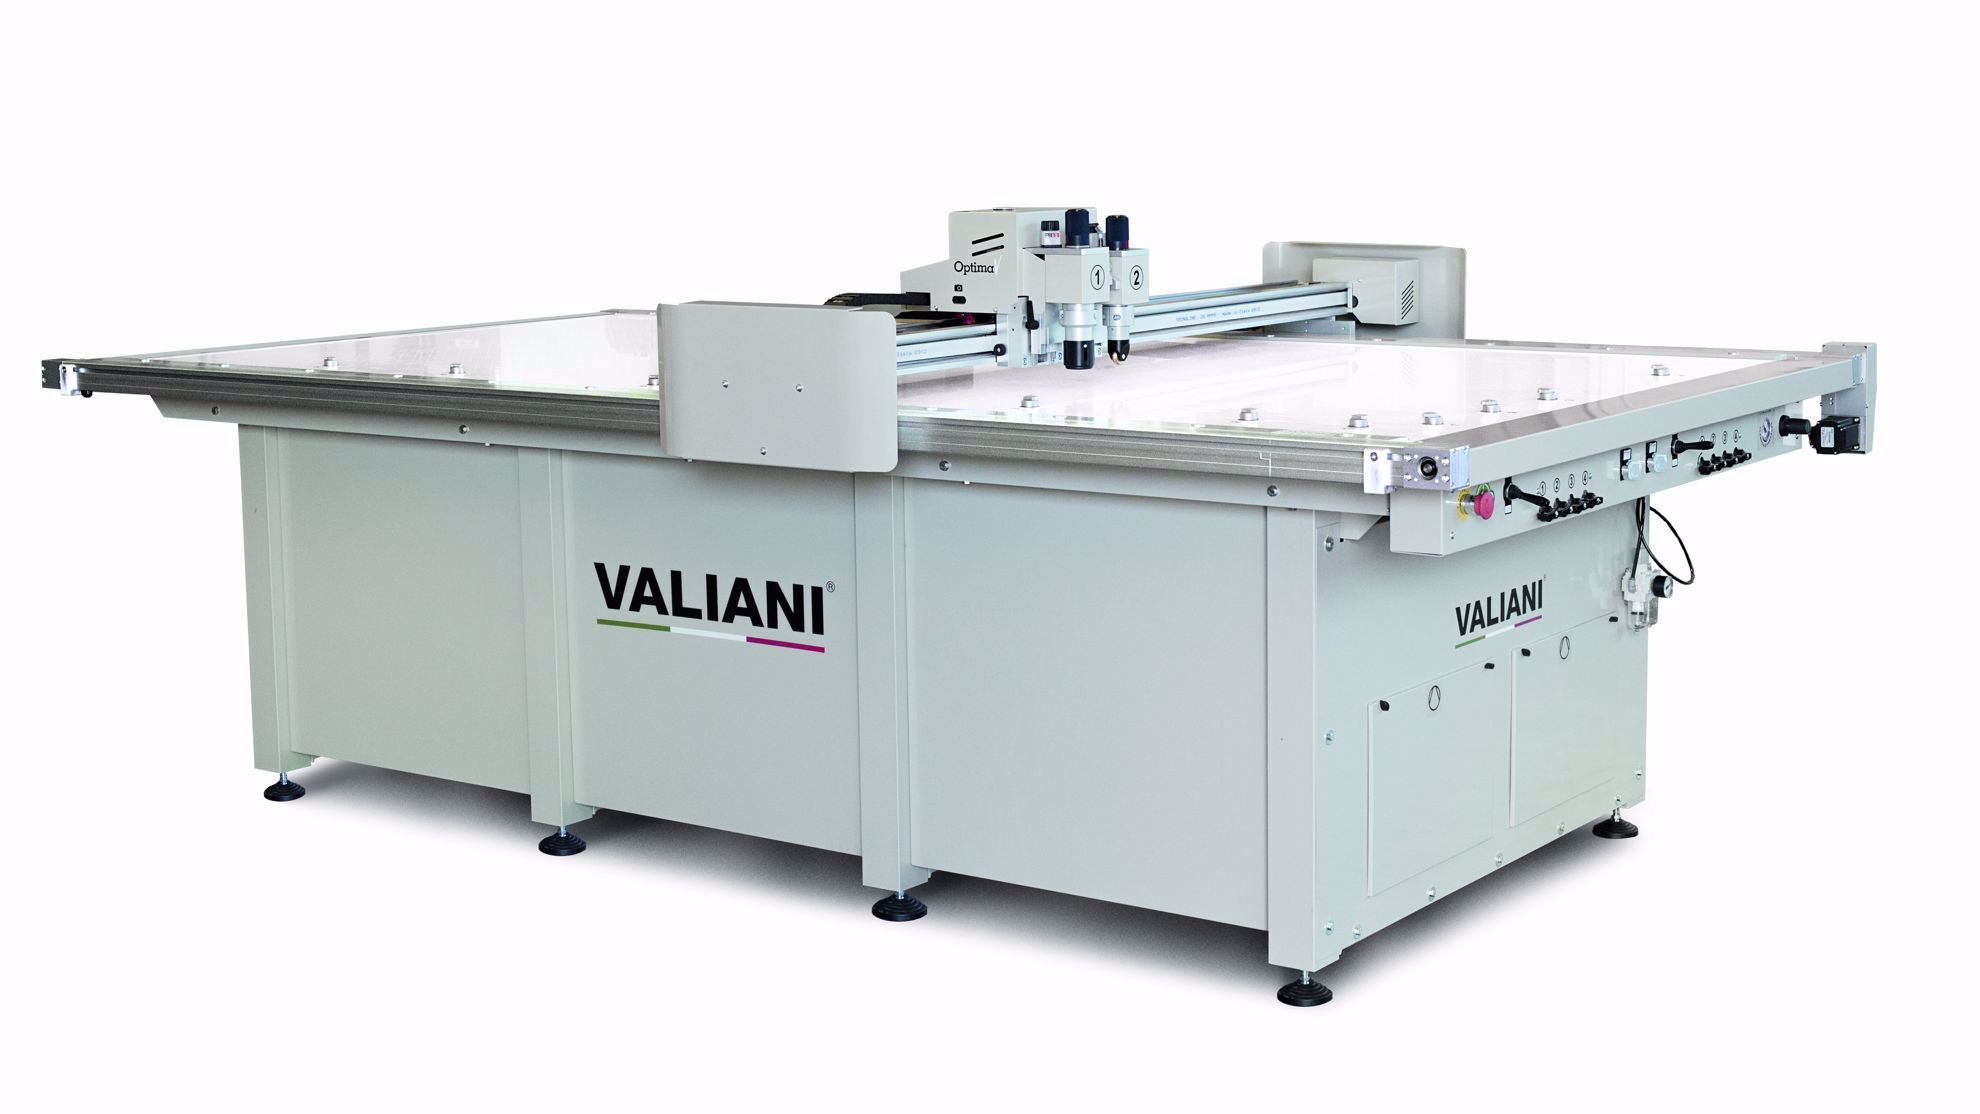 Picture of Valiani Optima